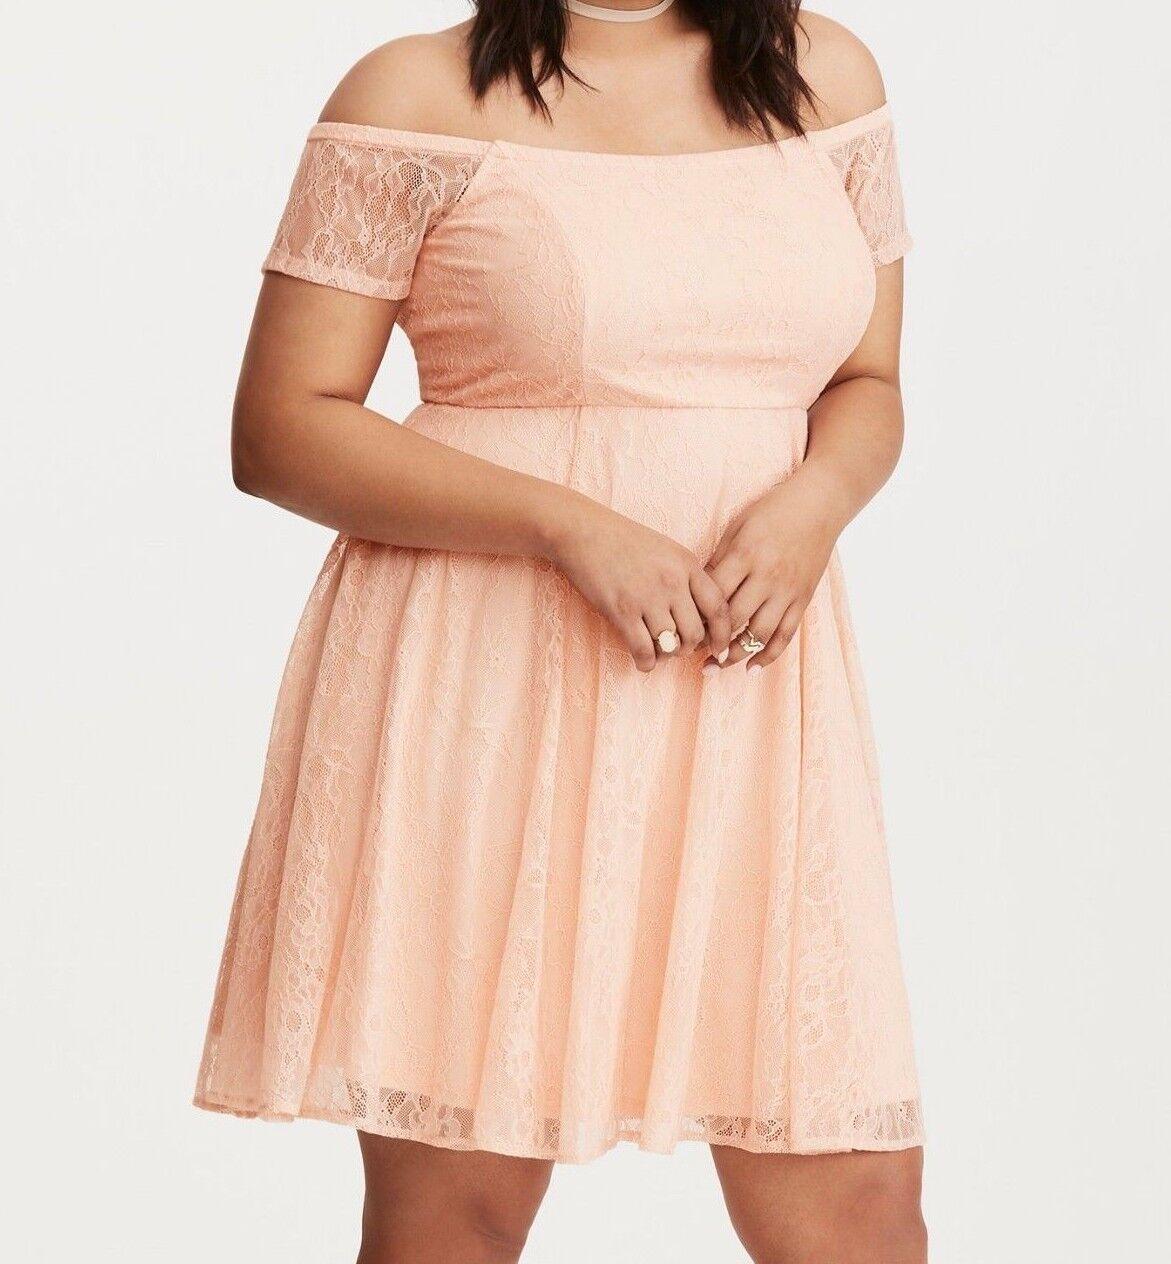 Torrid Lace Off the Shoulder Dress bluesh Pink 3X 24